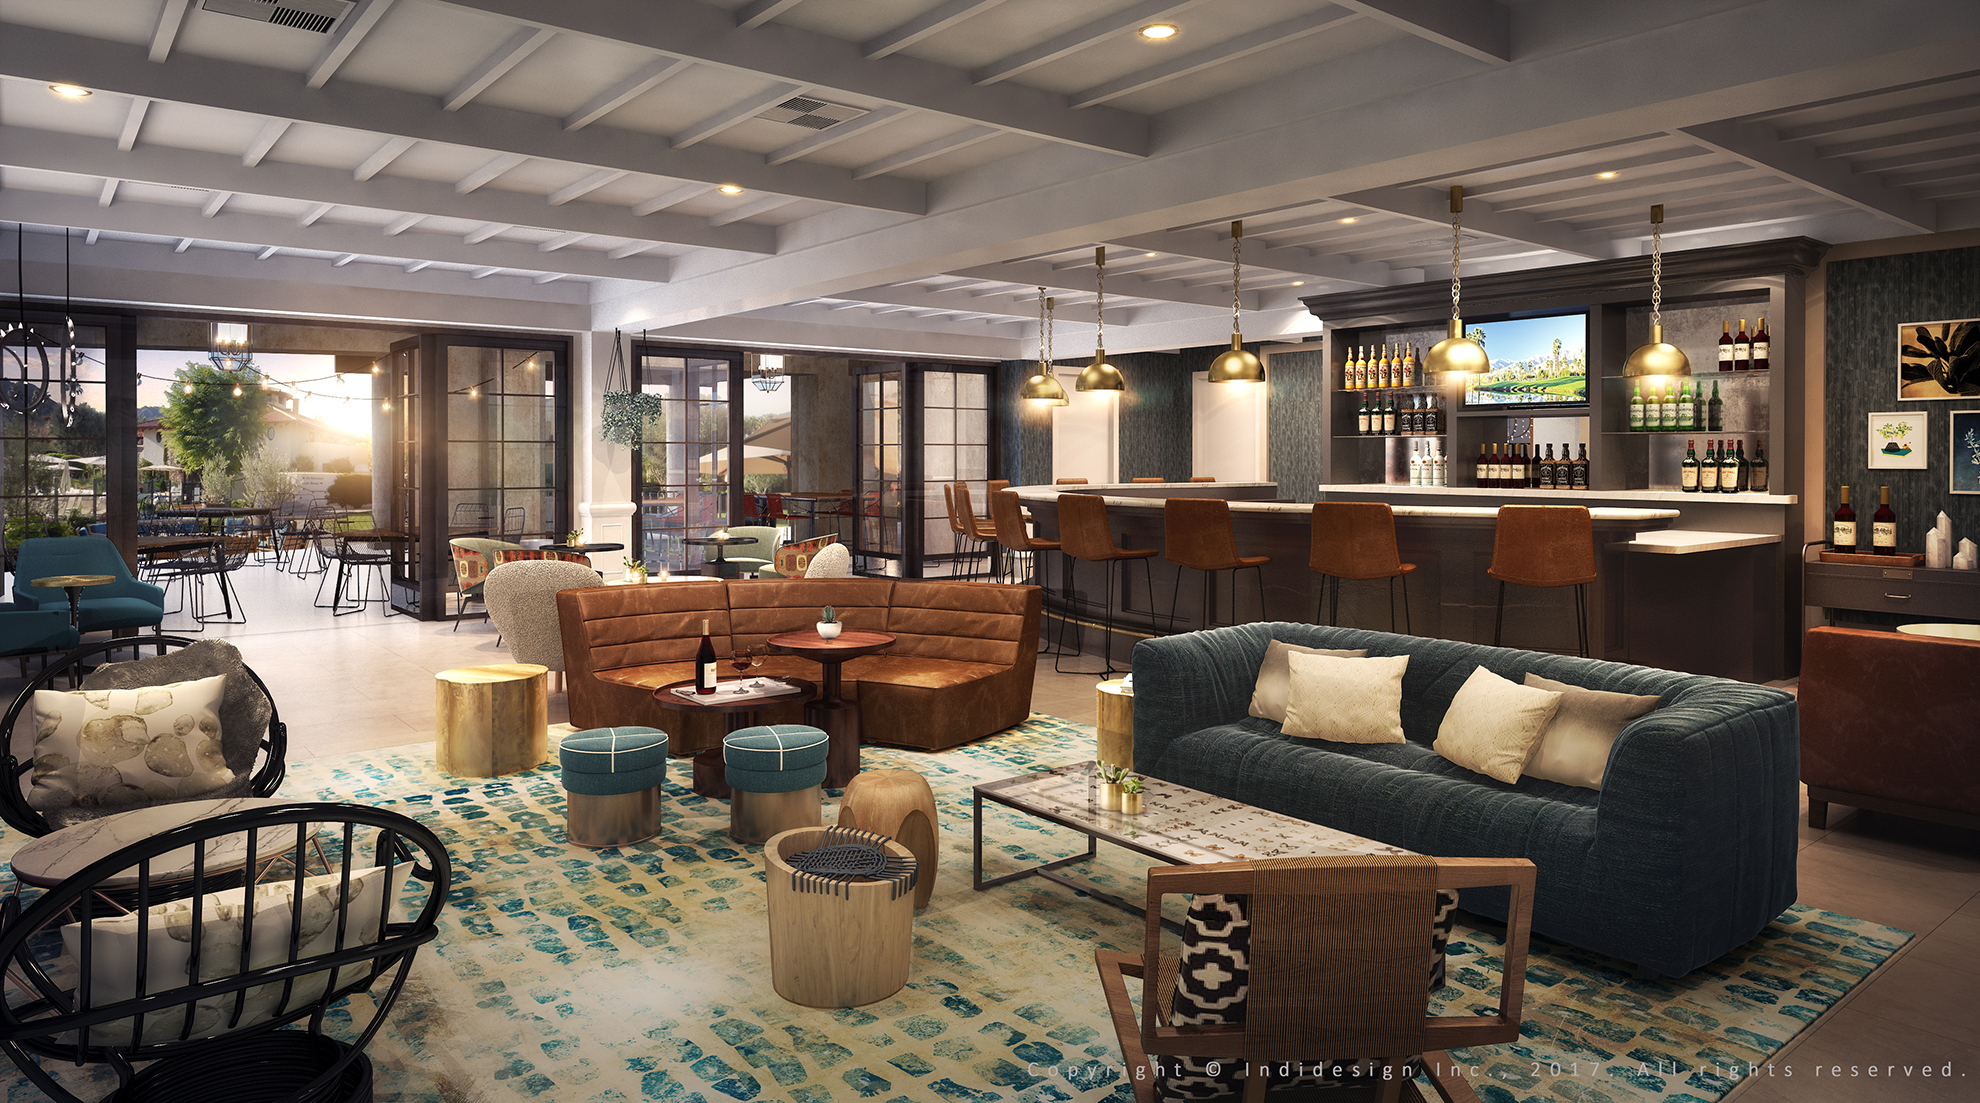 Miramonte Indian Wells Resort Completes $8 Million Renovation